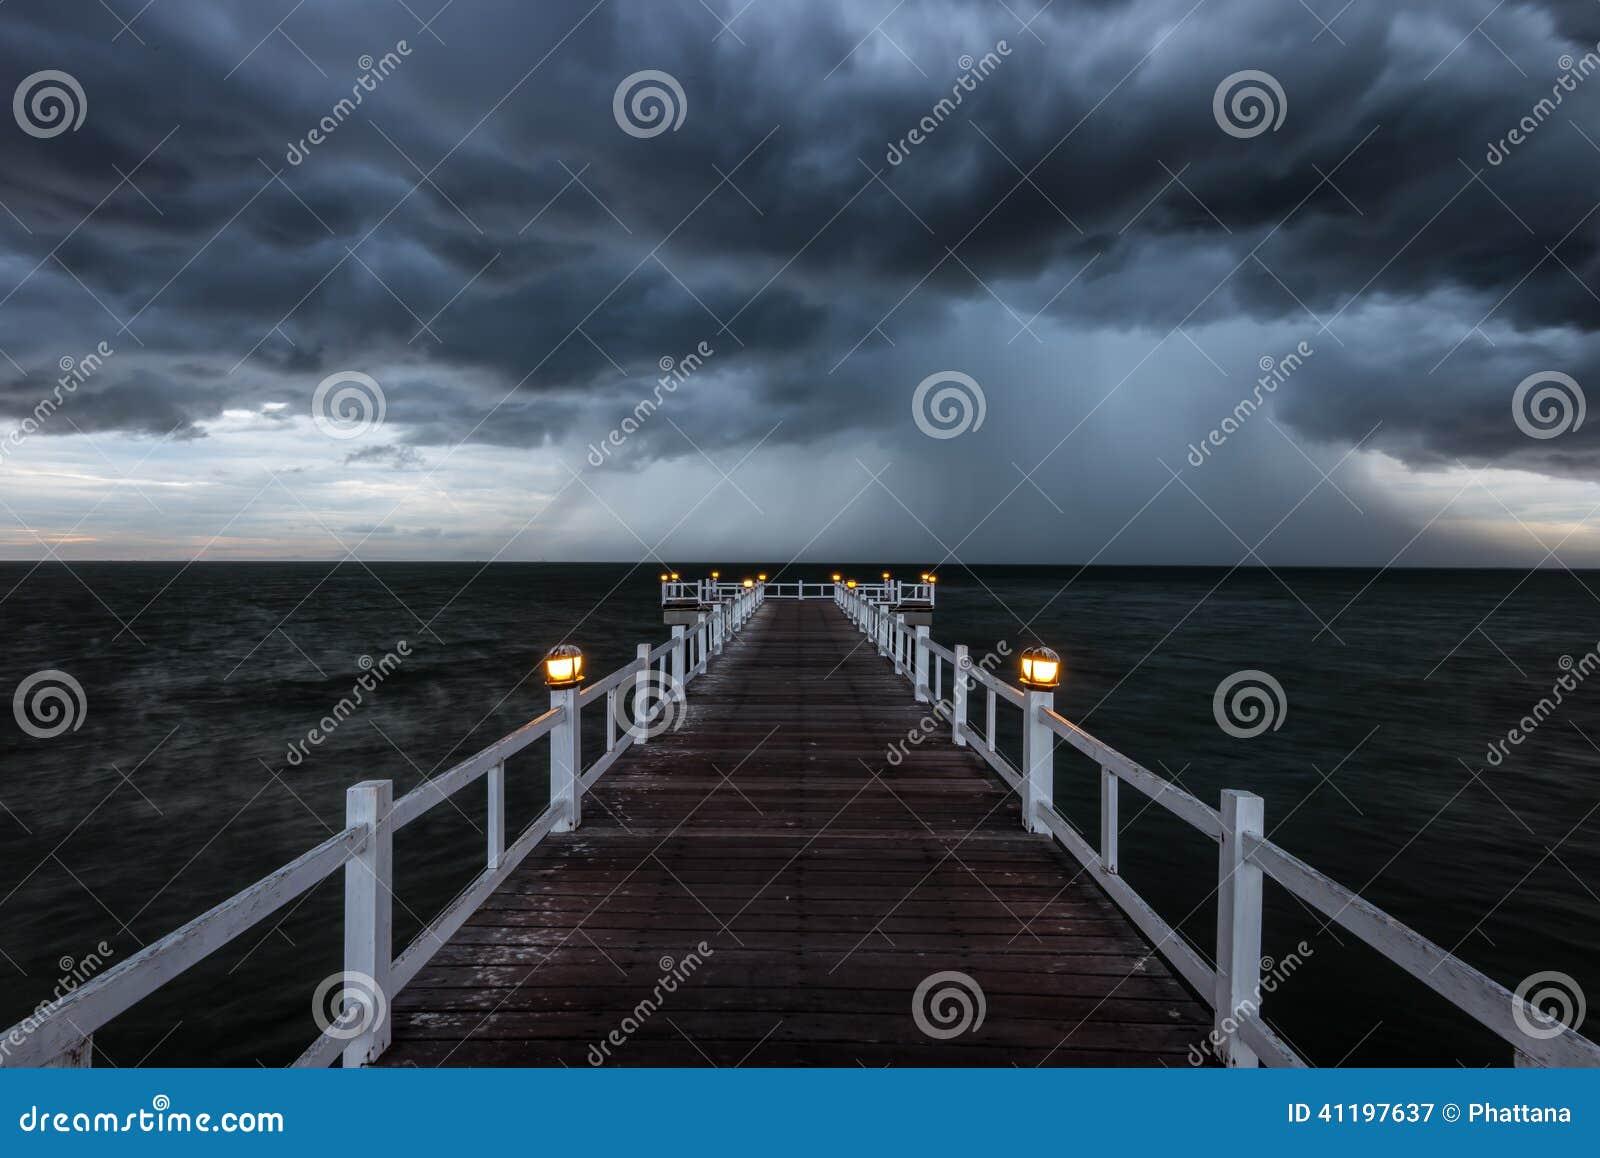 Holzbrücke in das Meer